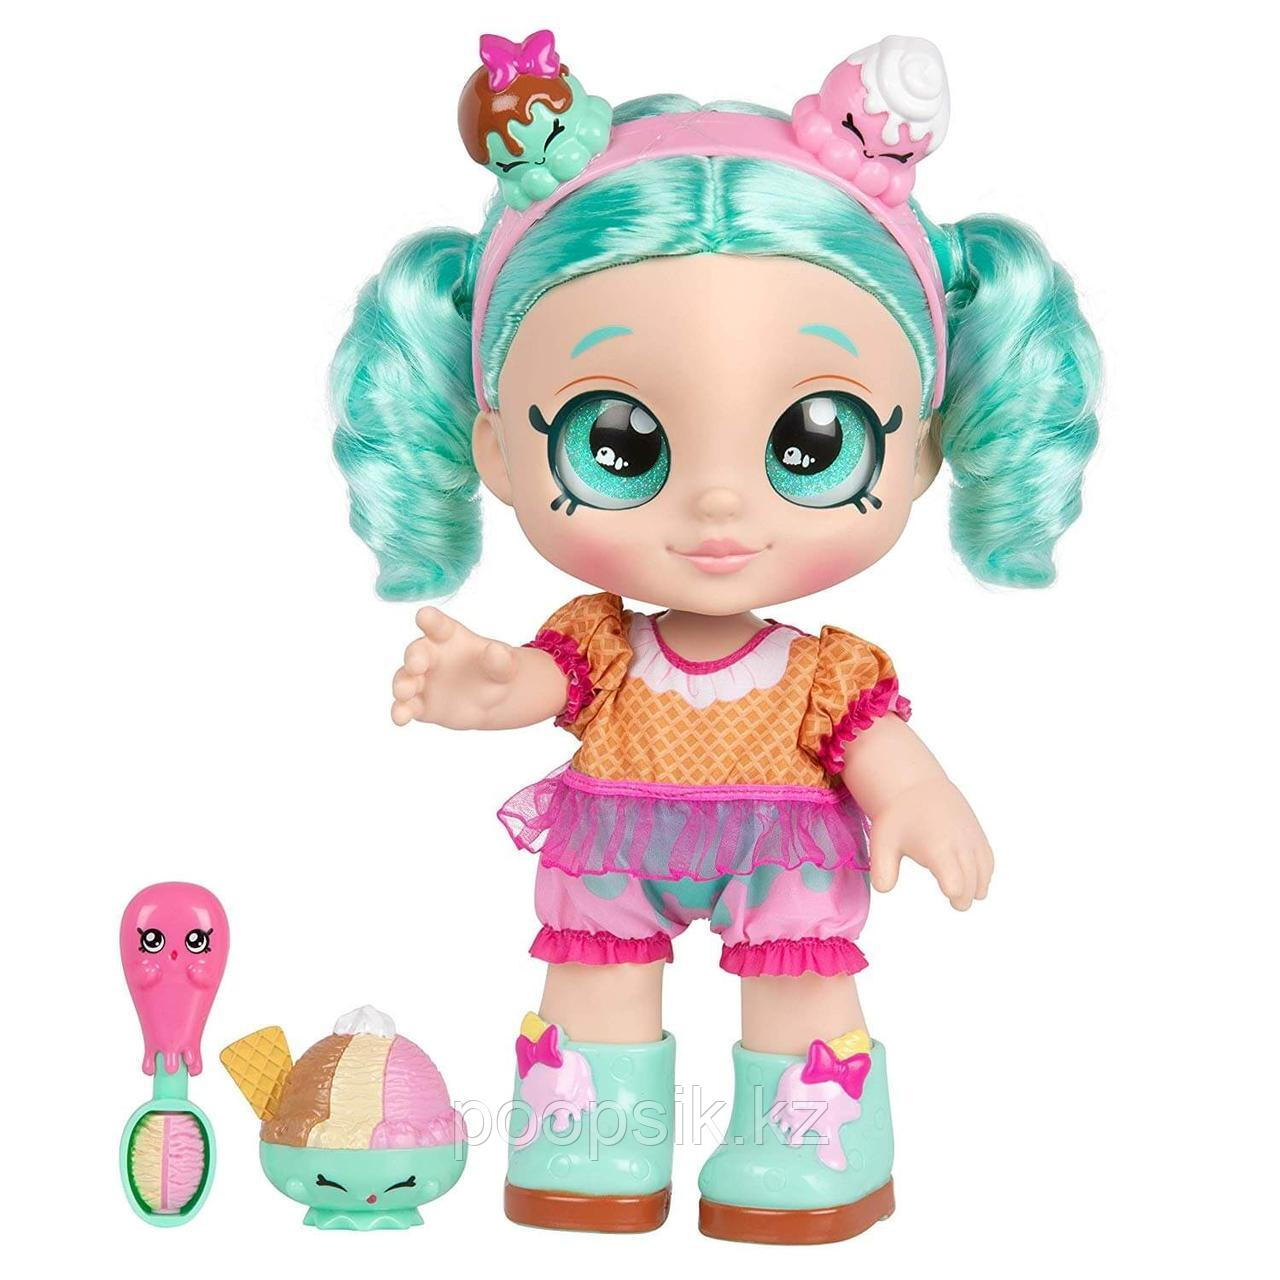 Кукла Кинди Кидс Пеппа Минт (Мороженка) 25см - фото 1